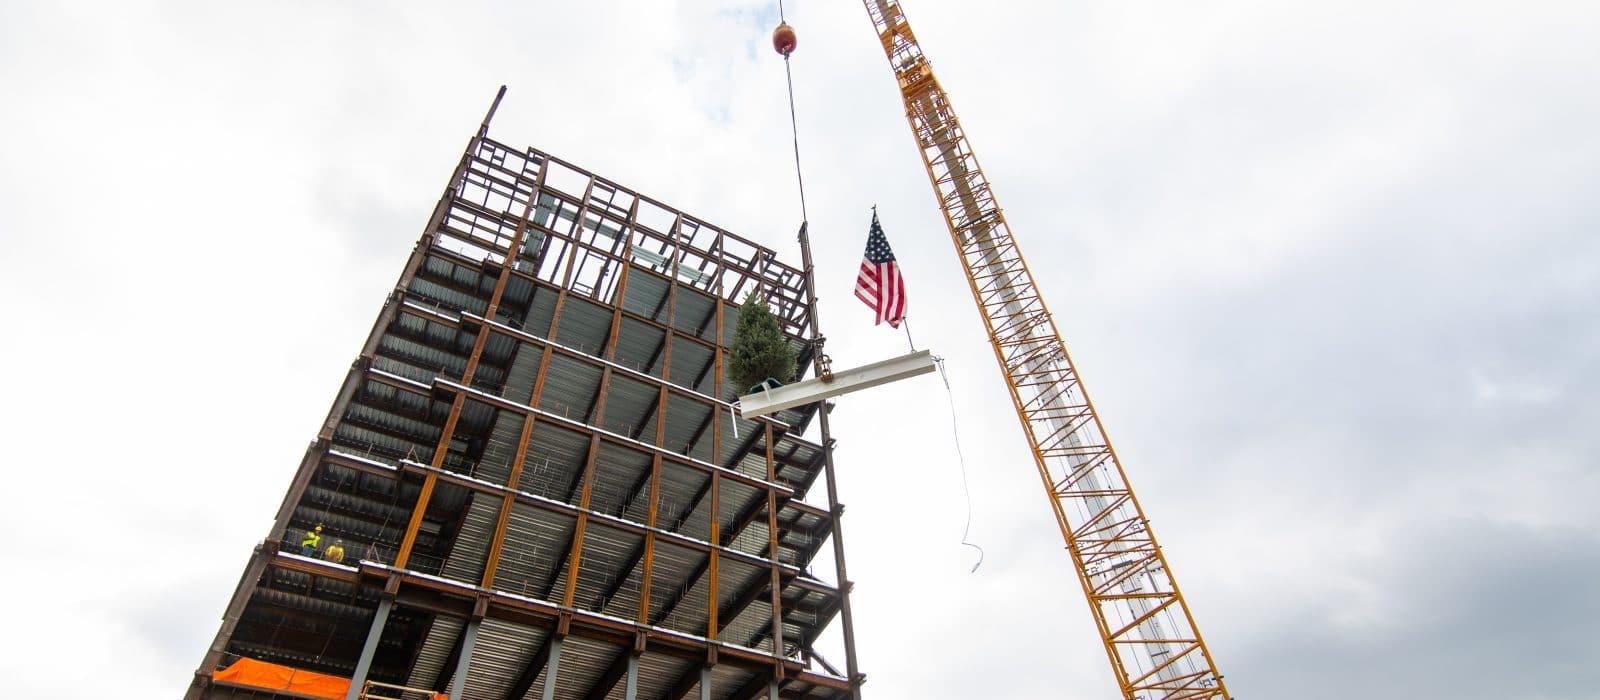 Beam Lift 2 Harrisburg Federal Courthouse